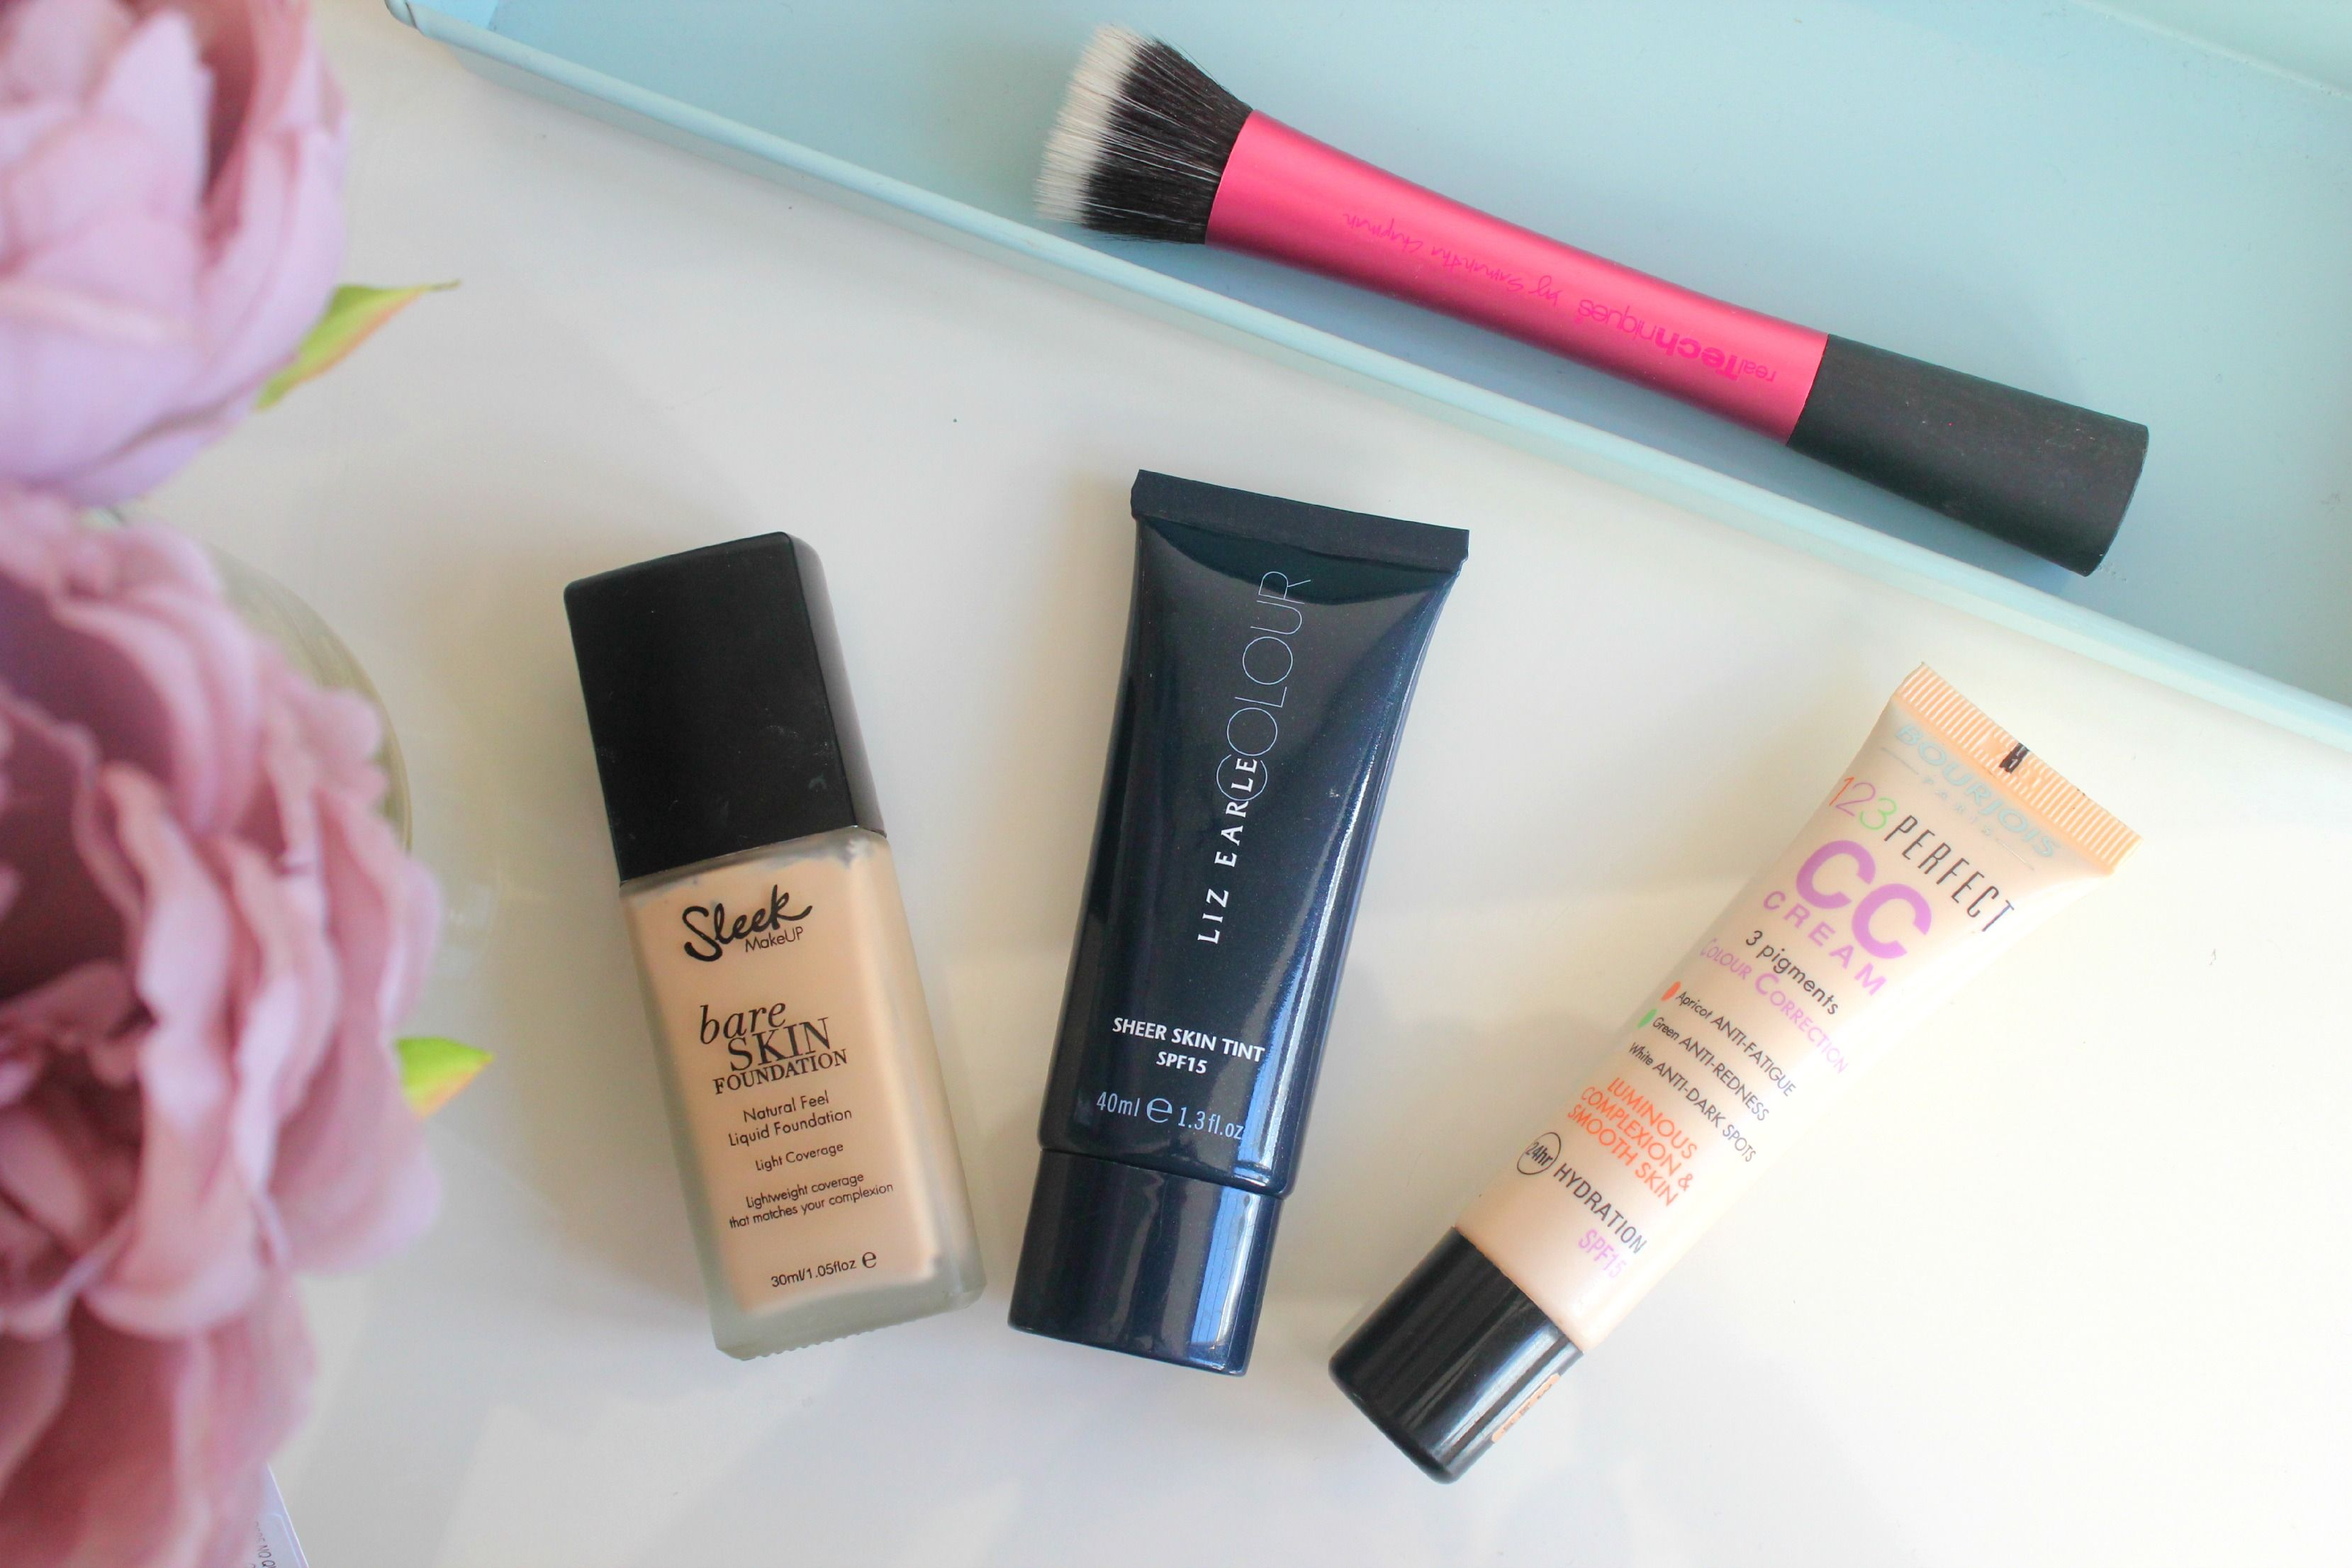 Spring foundation picks Lifestyle blogger